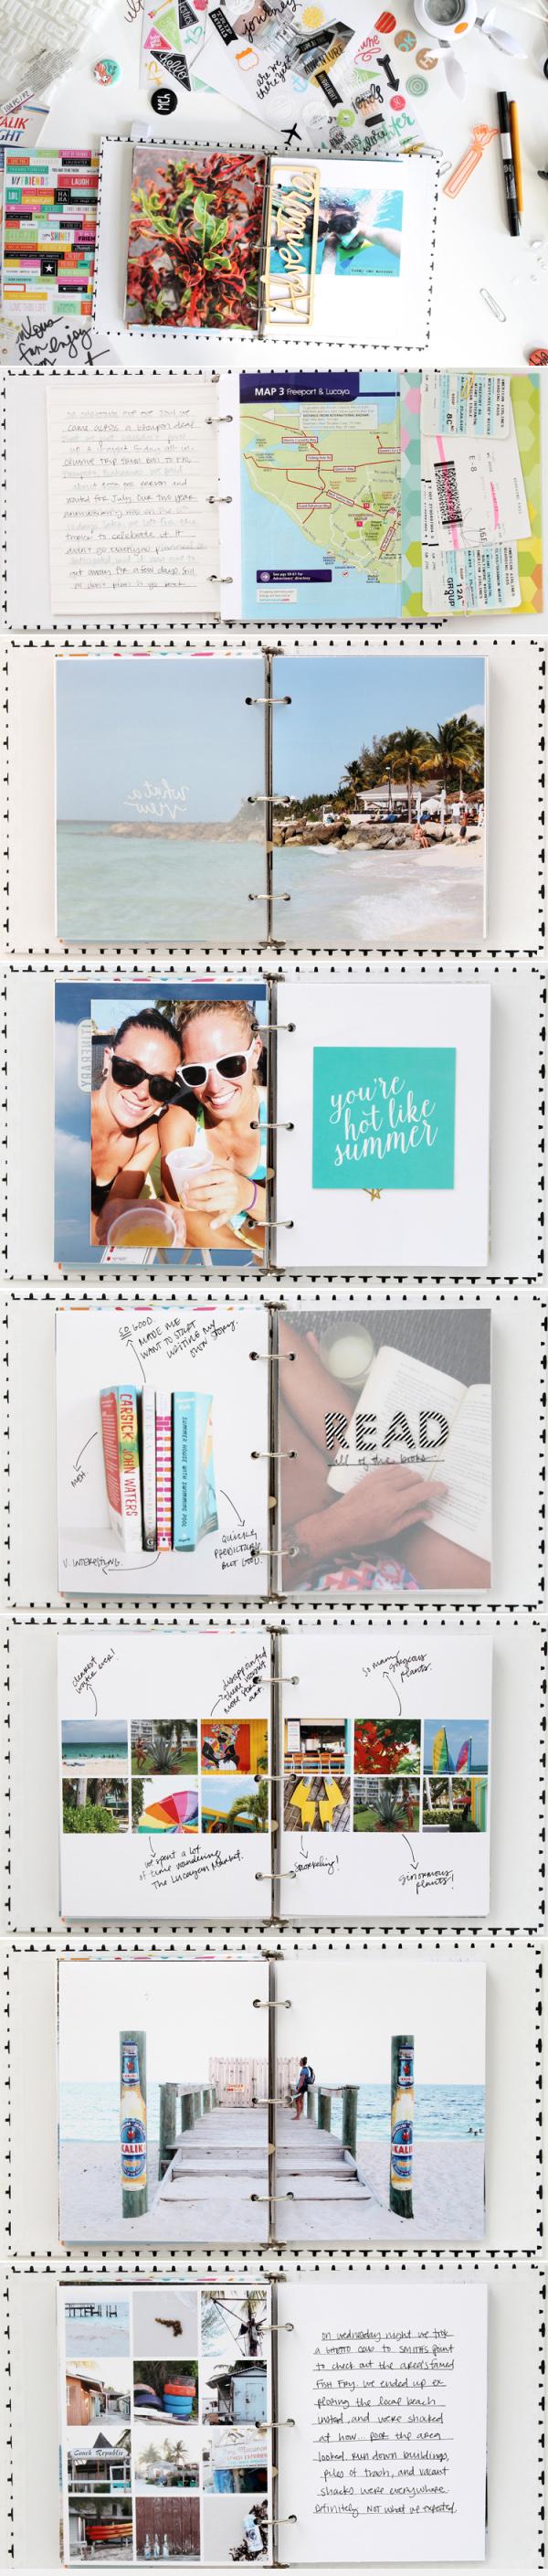 Bahama mini travel album from www.kelseyespecially.com